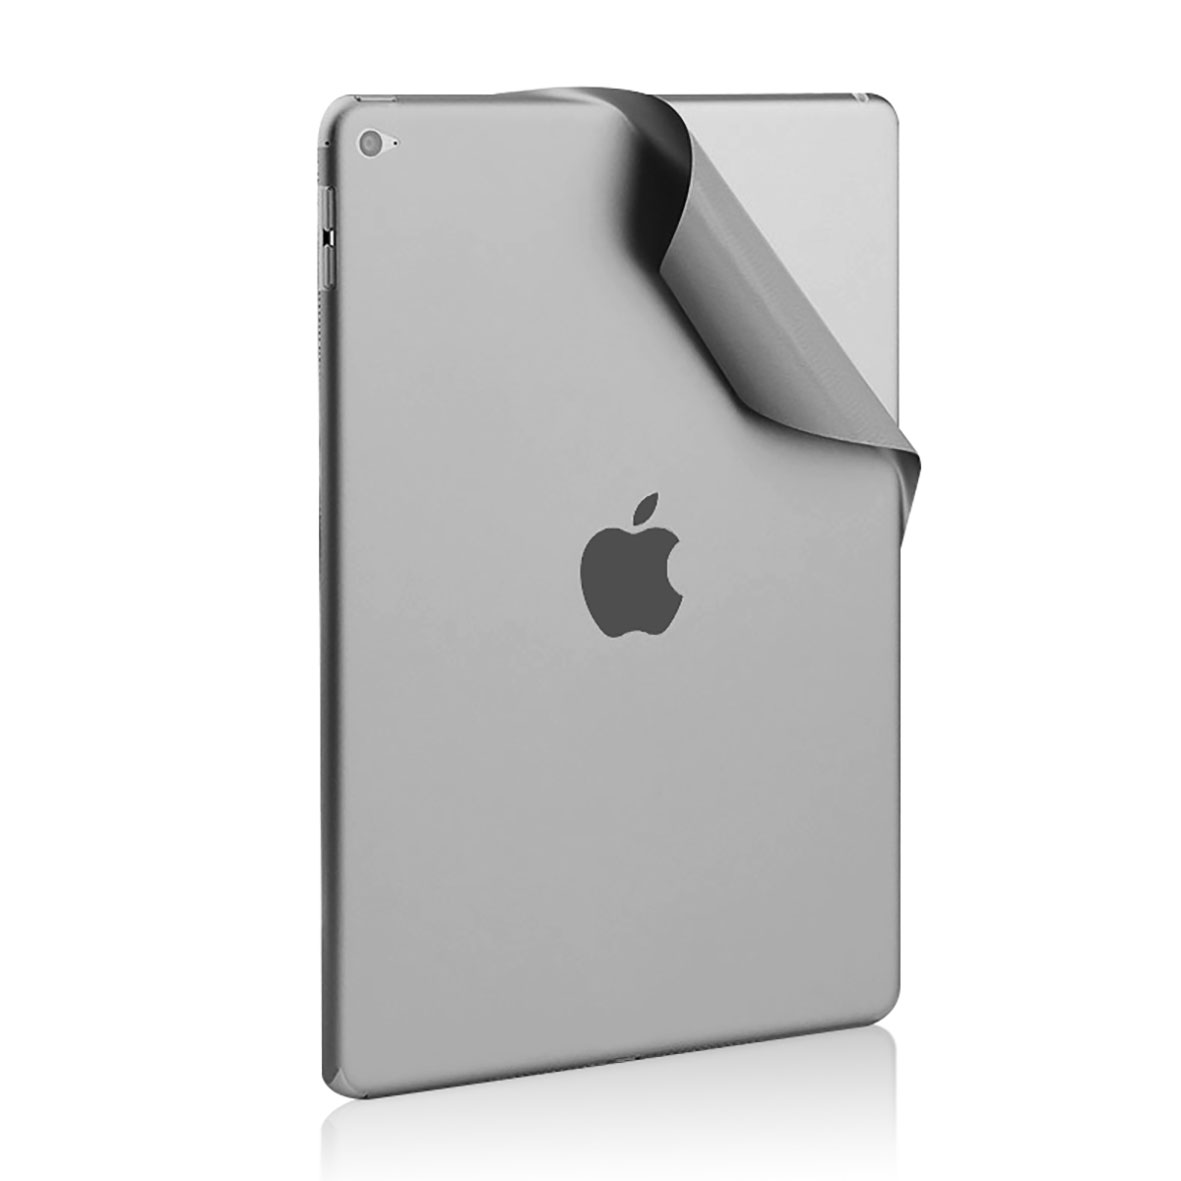 KMP Protective Skin Schutzfolie für iPad Mini 4, grau